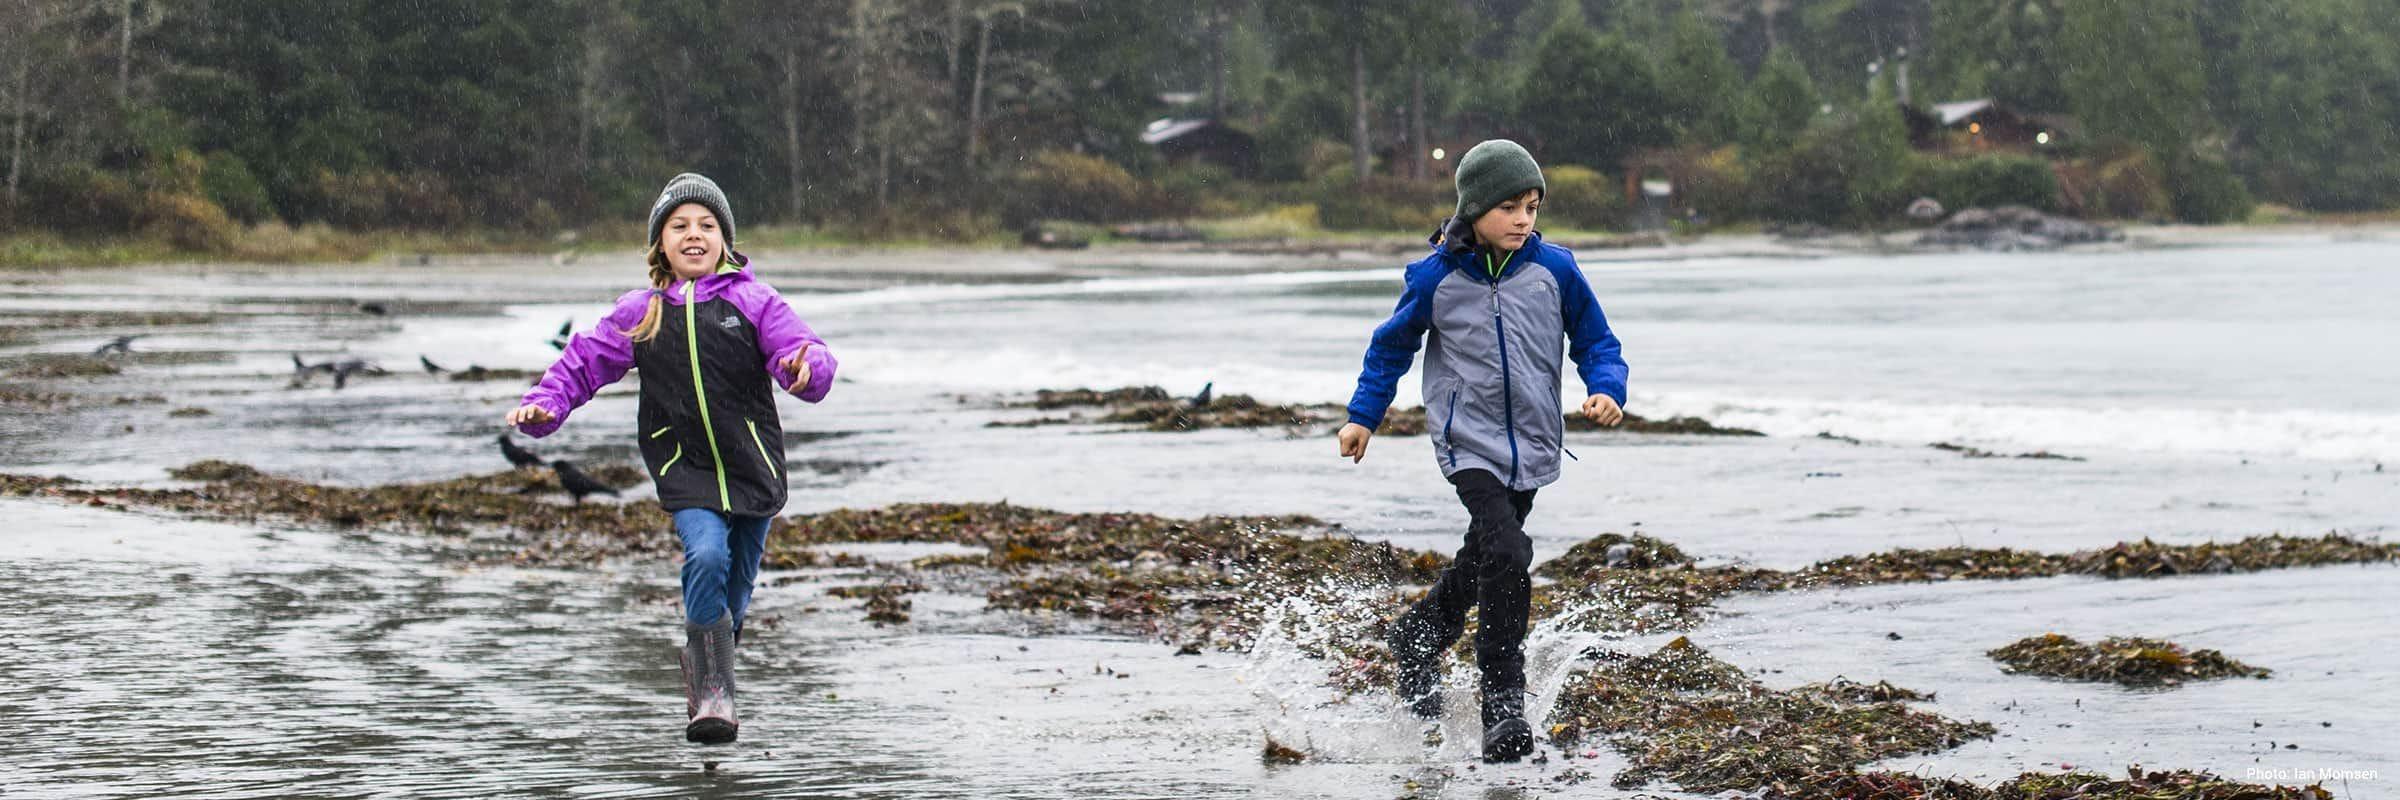 ddde1ce81a5b Top Waterproof Raincoats for Kids